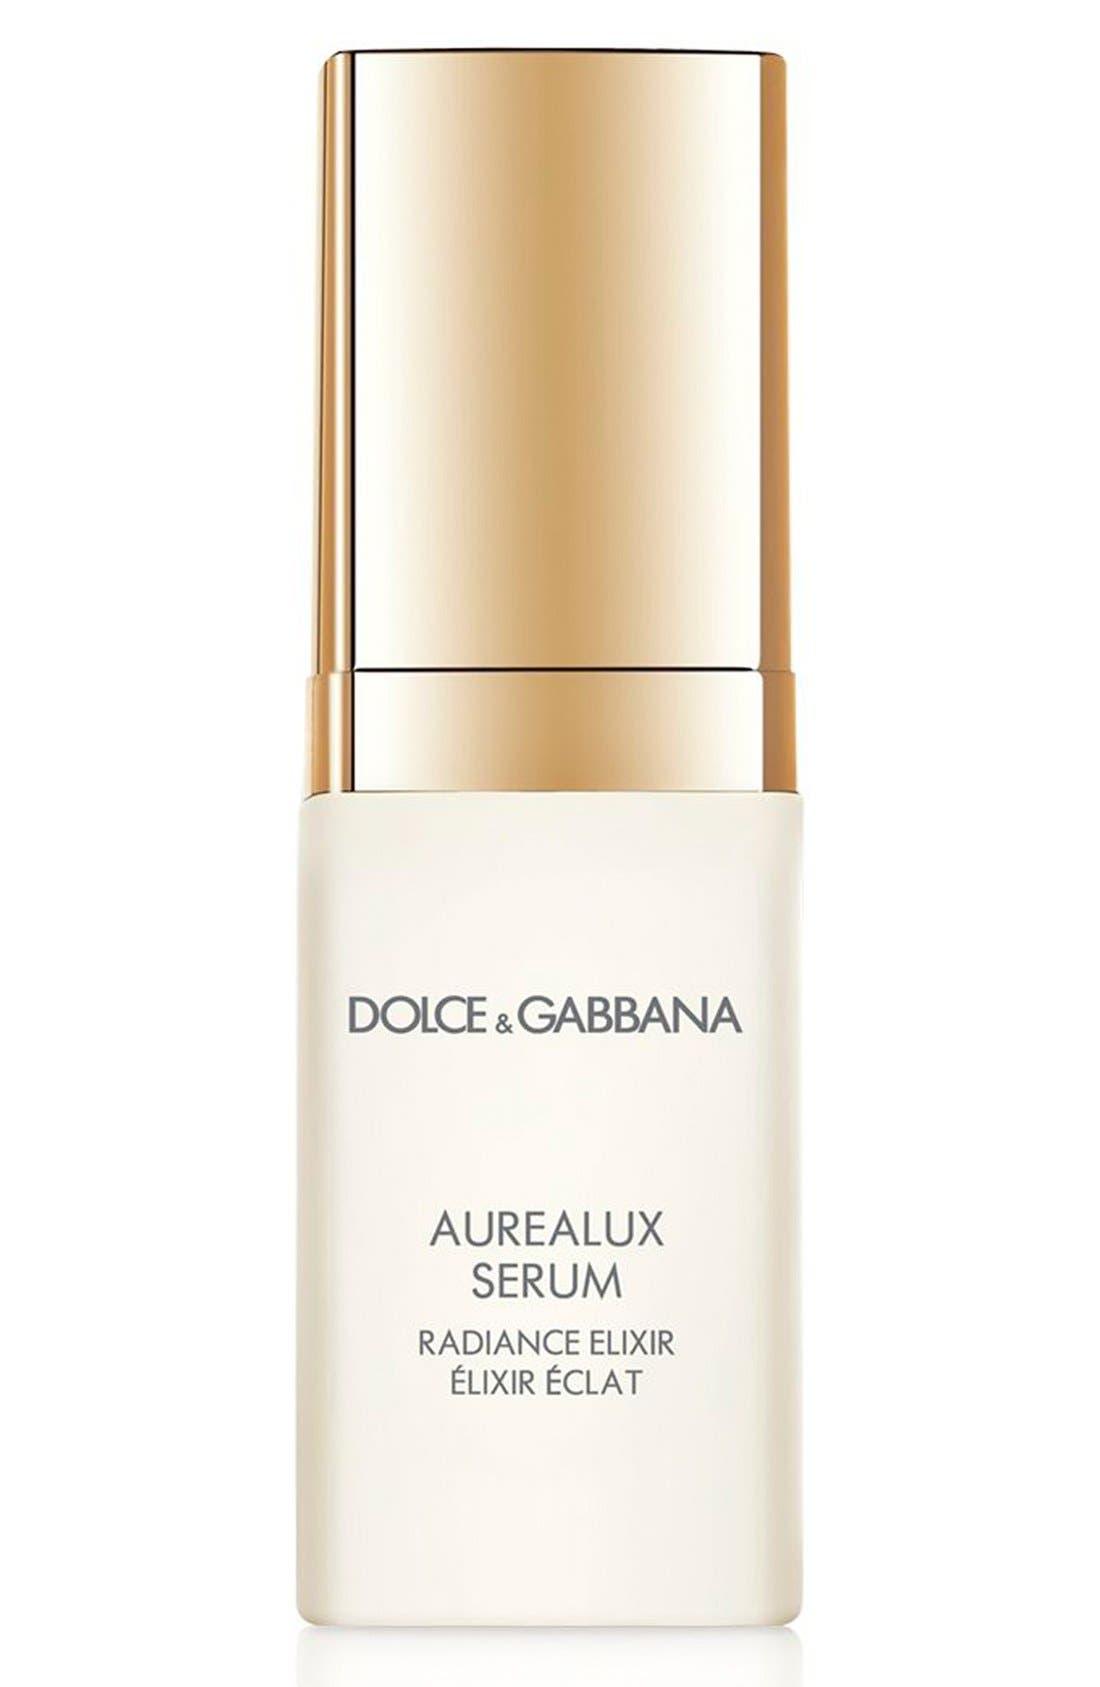 Dolce&GabbanaBeauty 'Aurealux' Serum Radiance Elixir